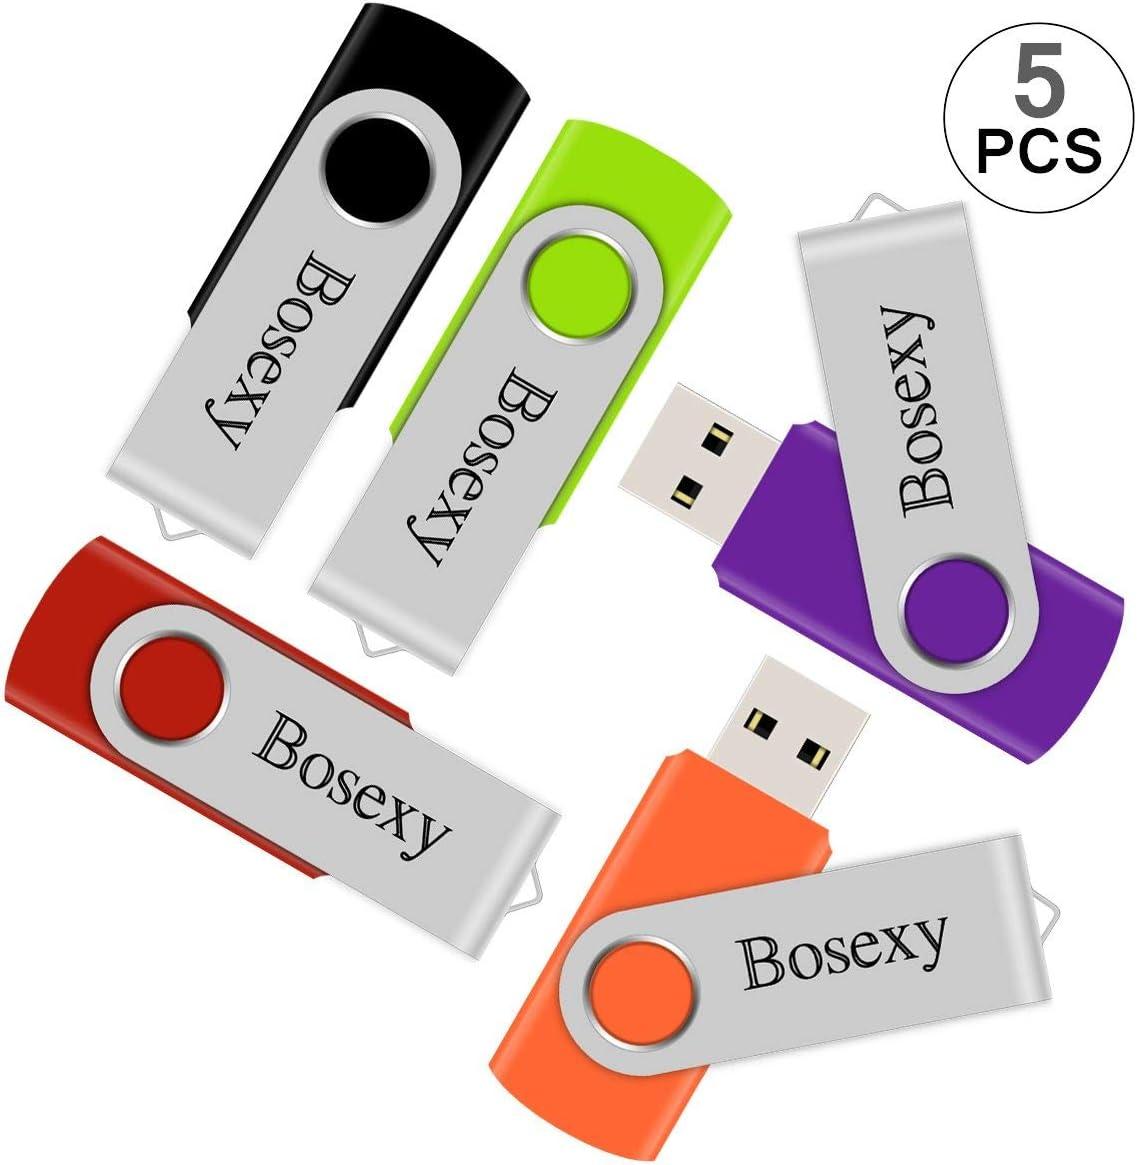 5PCS 8GB USB Flash Drive Swivel USB Memory Stick Flash Pen Drive for Desktop Mac